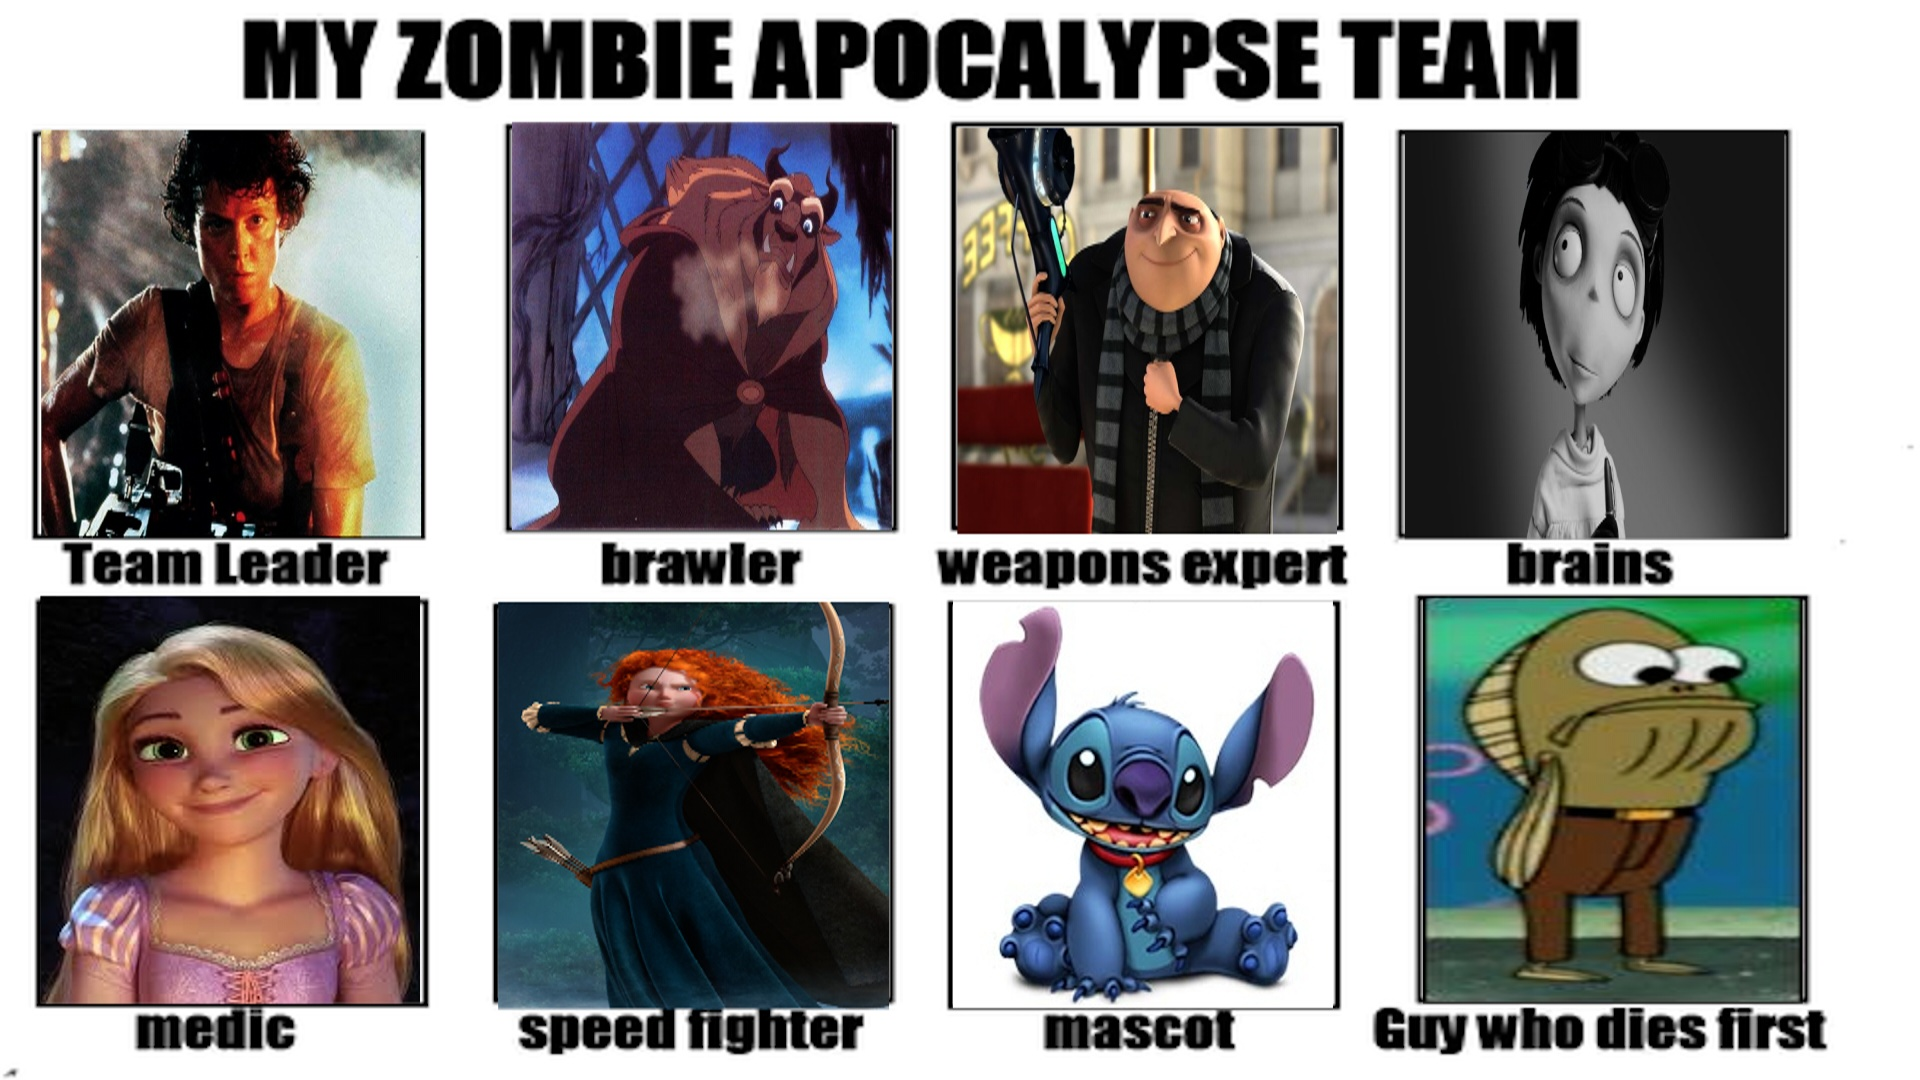 Zombie Apocalypse Meme Funny : My zombie apocalypse team meme by normanjokerwise